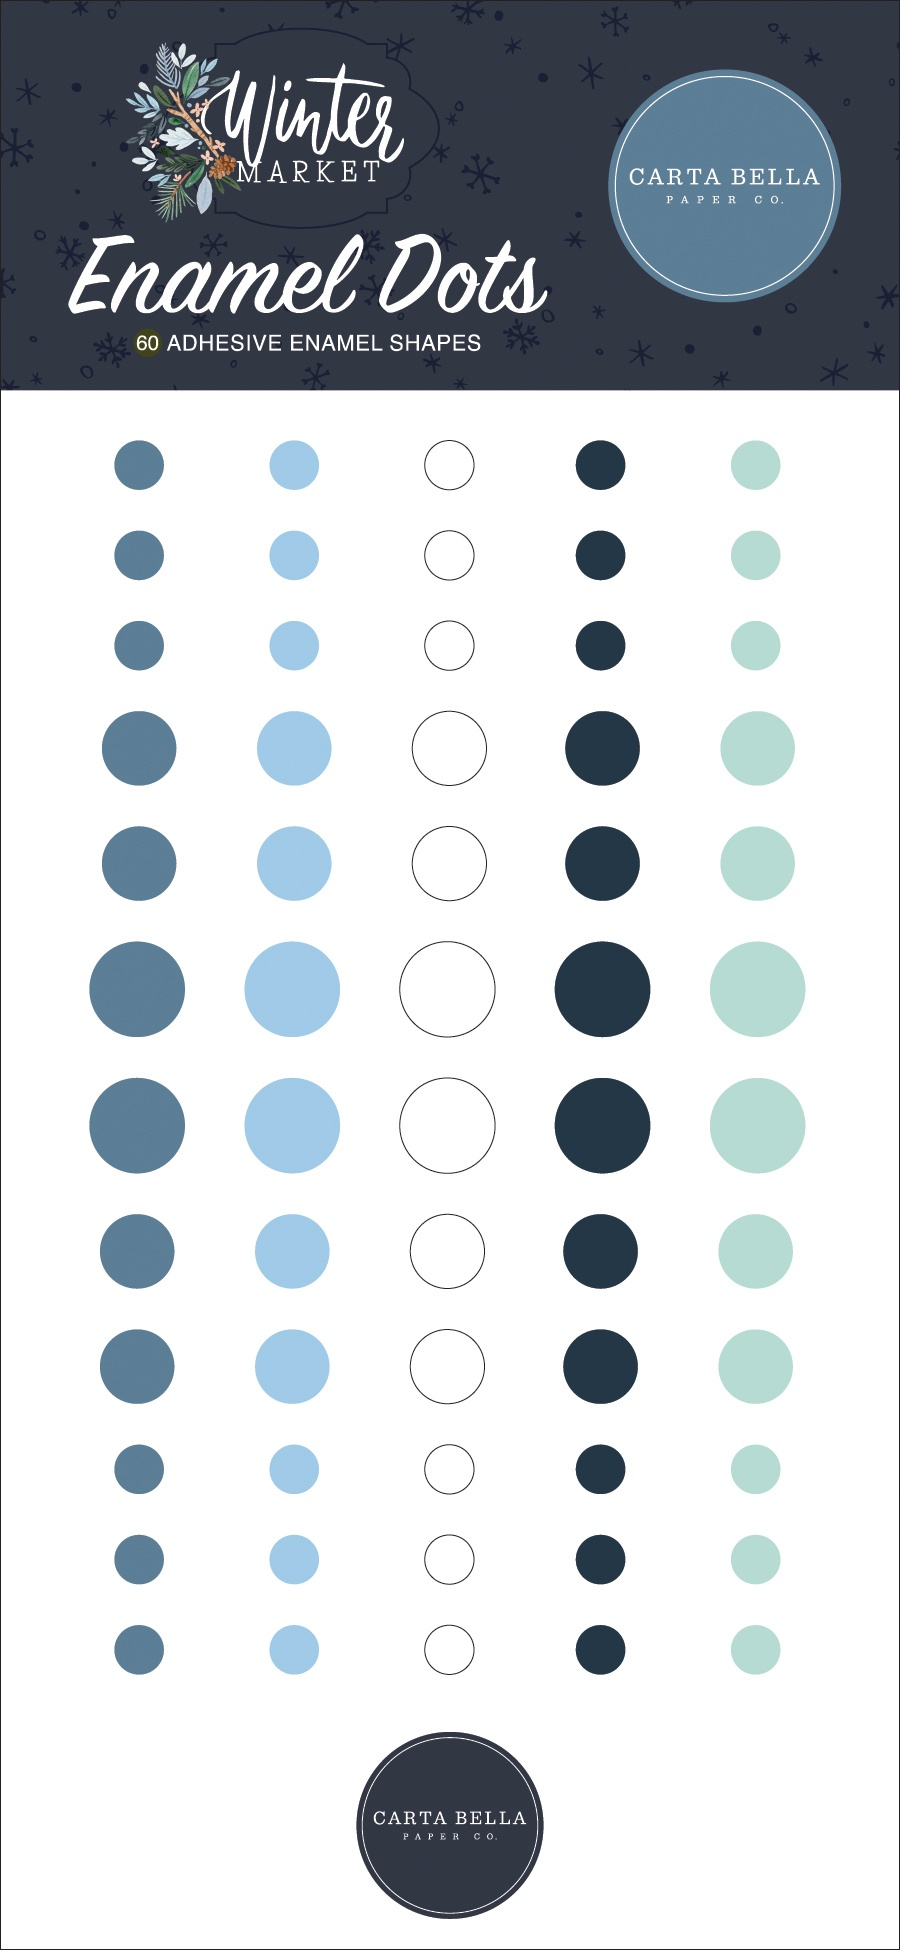 Carta Bella Adhesive Enamel Dots 60/Pkg-Winter Market